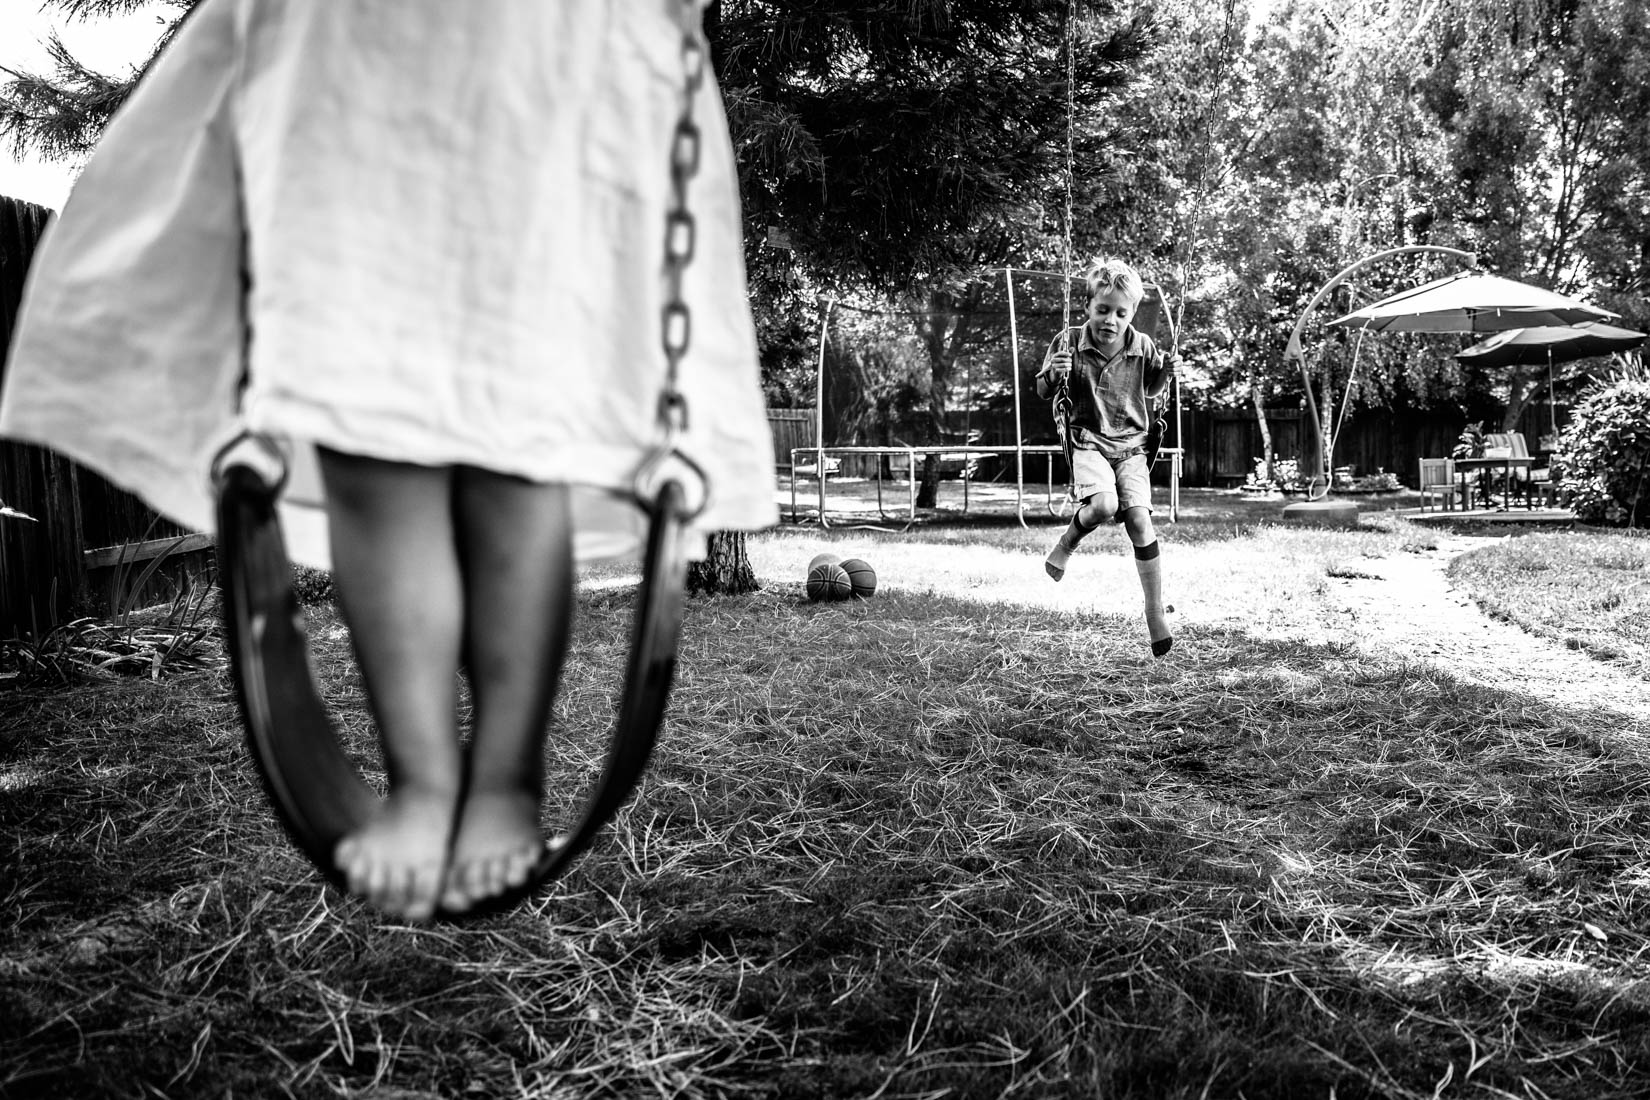 Two siblings swinging on the backyard swings having fun.